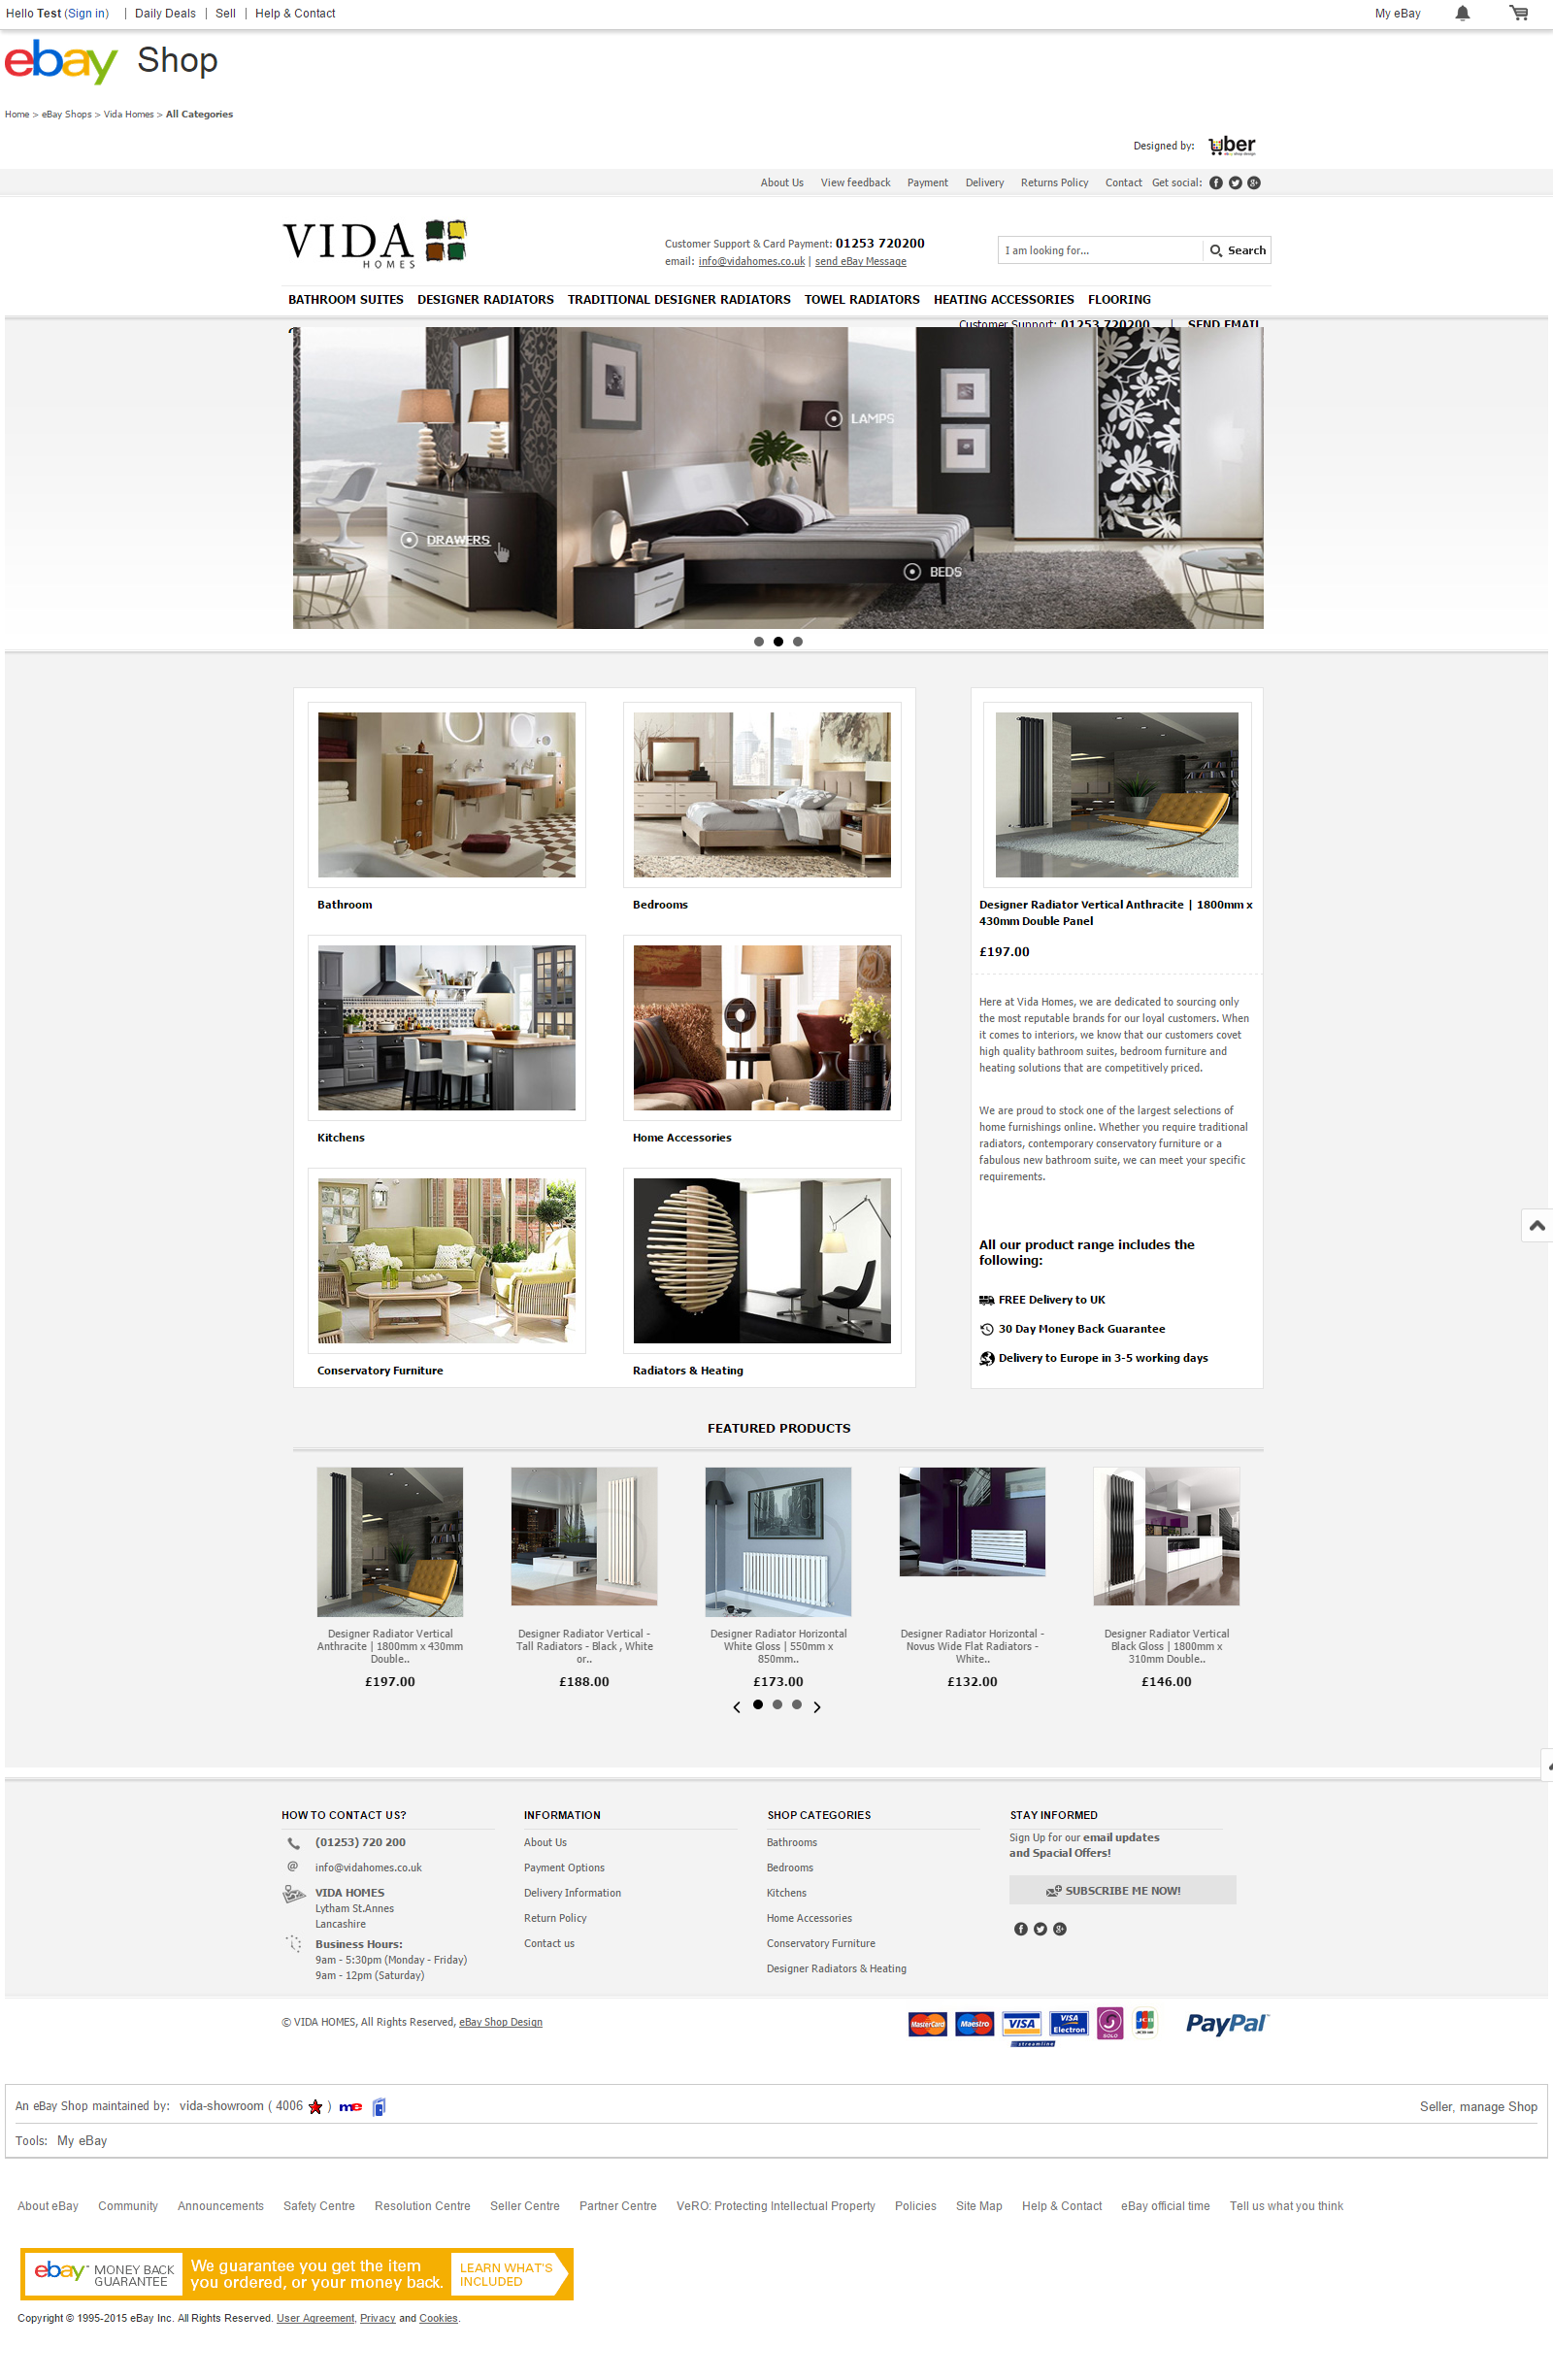 stores-ebay-co-uk-Vida-Homes